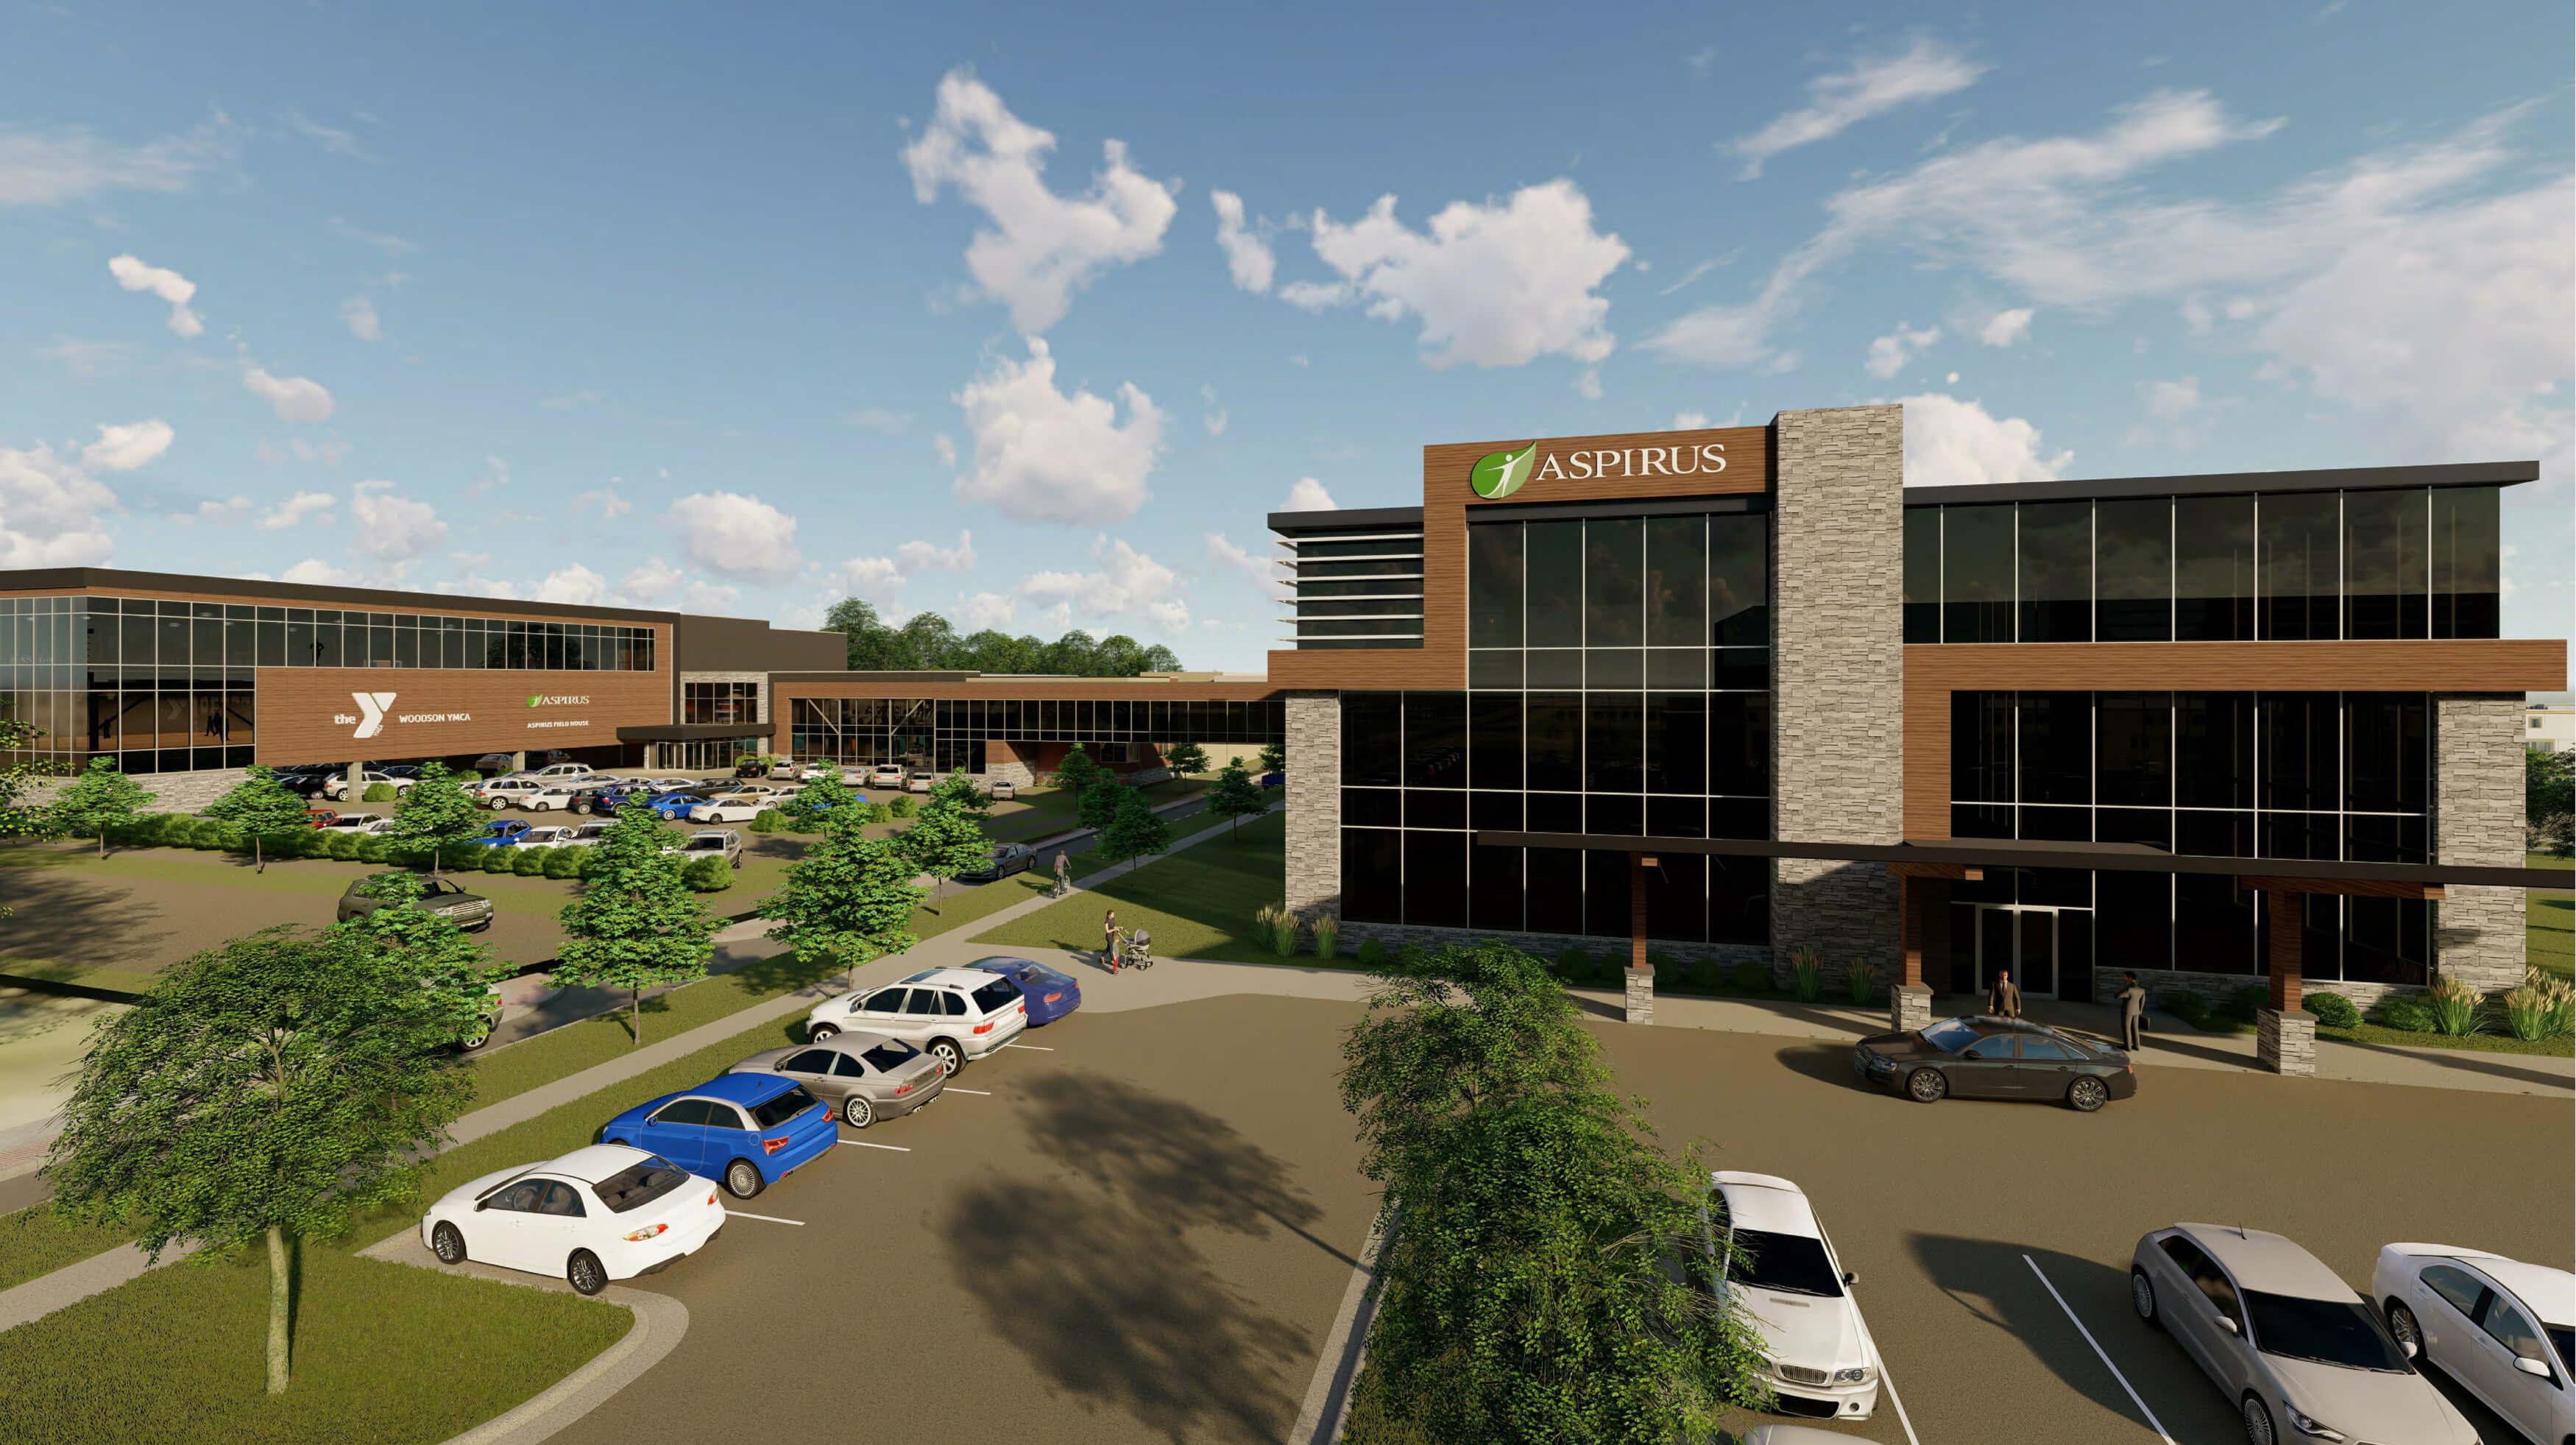 Downtown Health Wellness Campus Aspirus Care